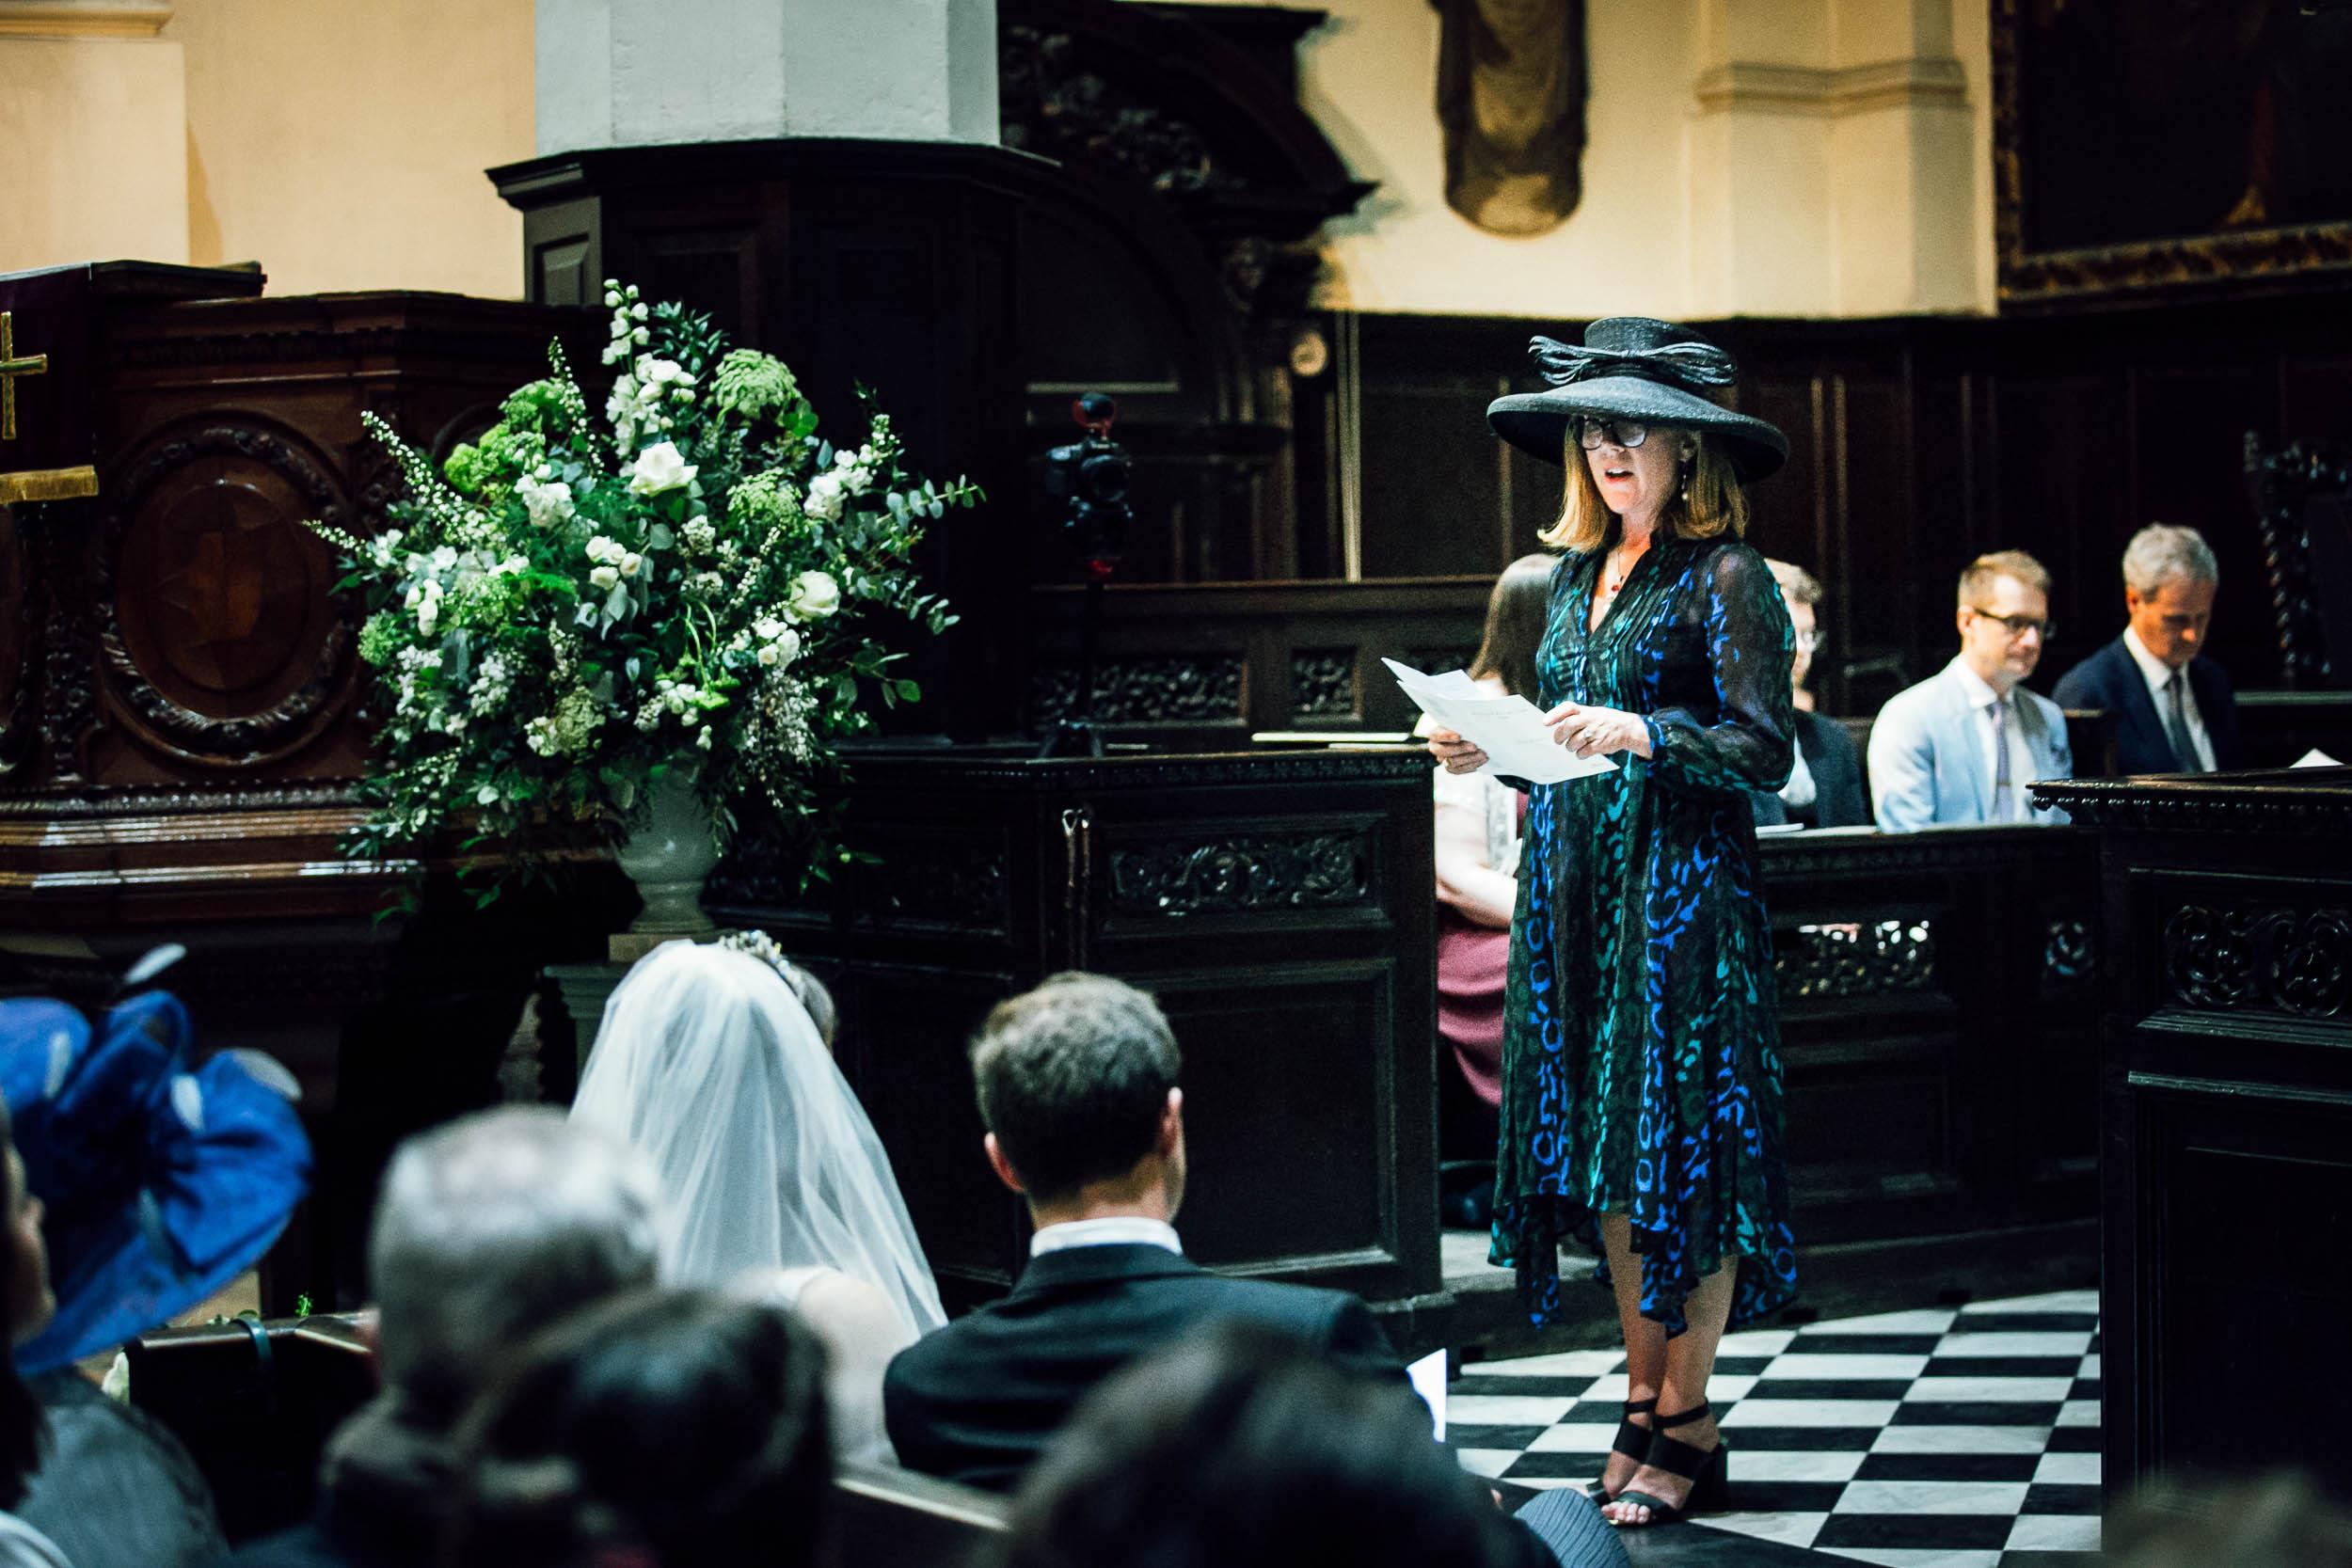 stationers-hall-wedding-photographer-london 036.jpg